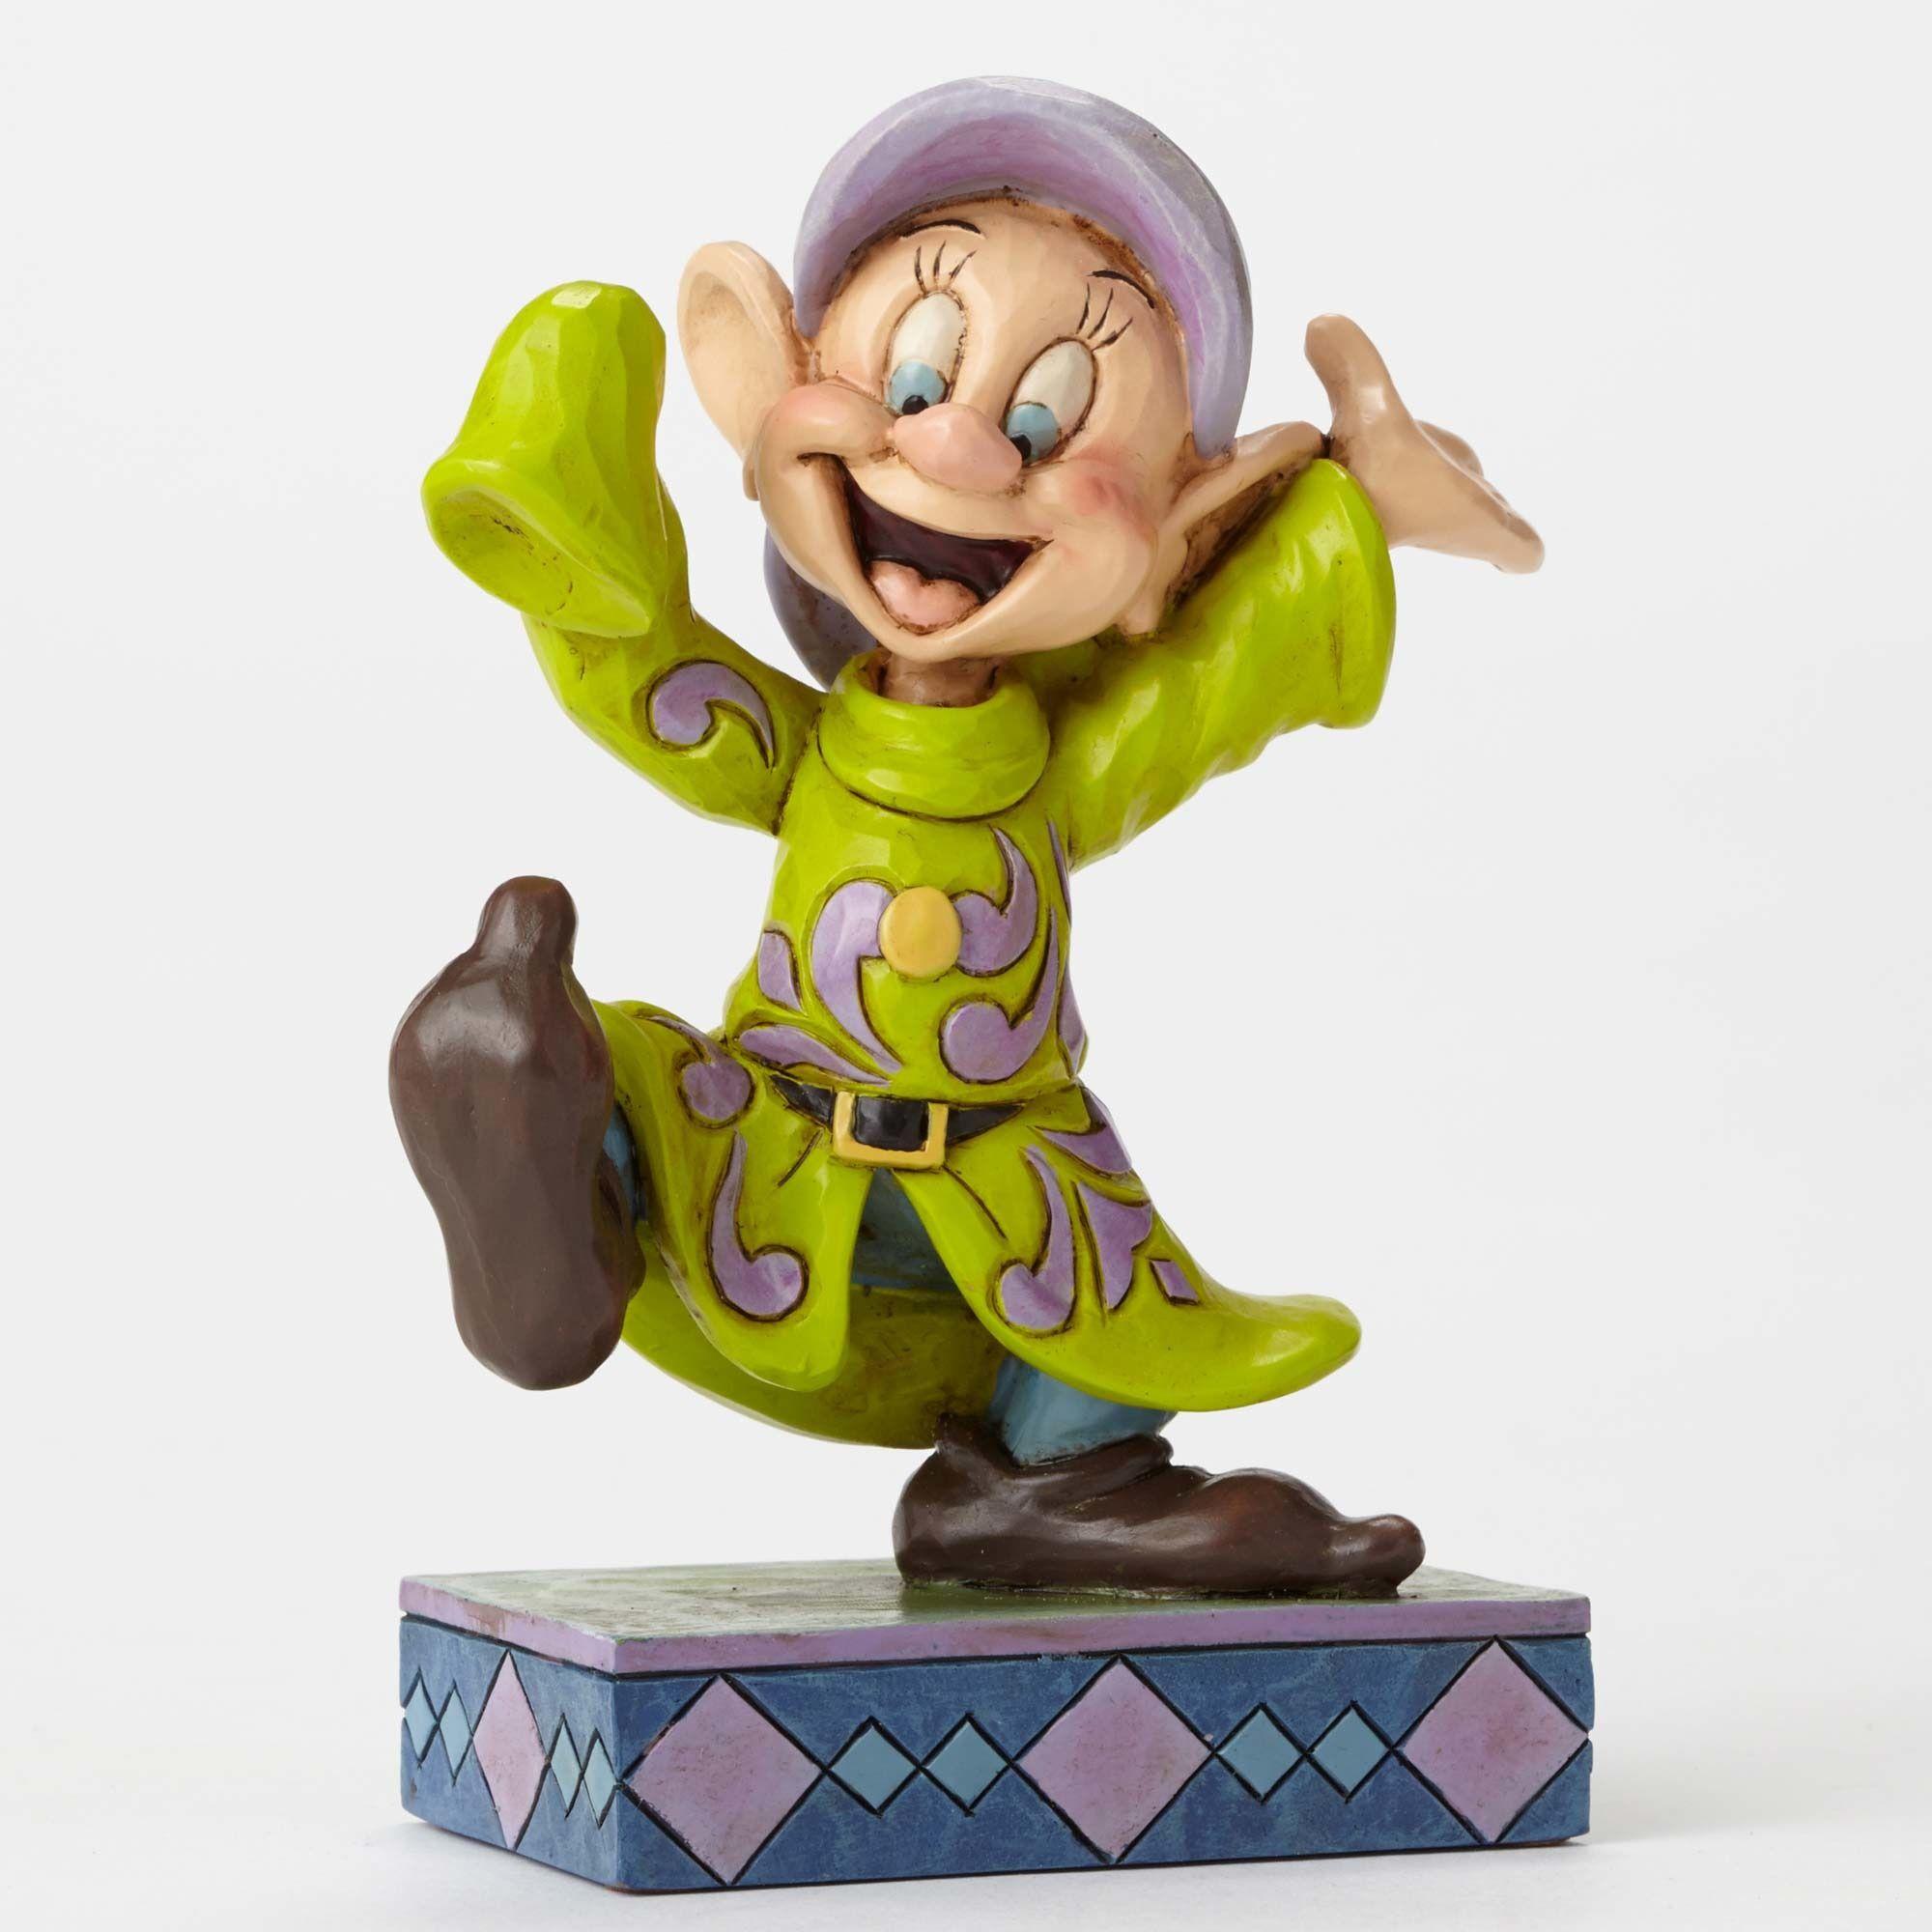 Dopey Figurine   Disney traditions, Disney figurines ...